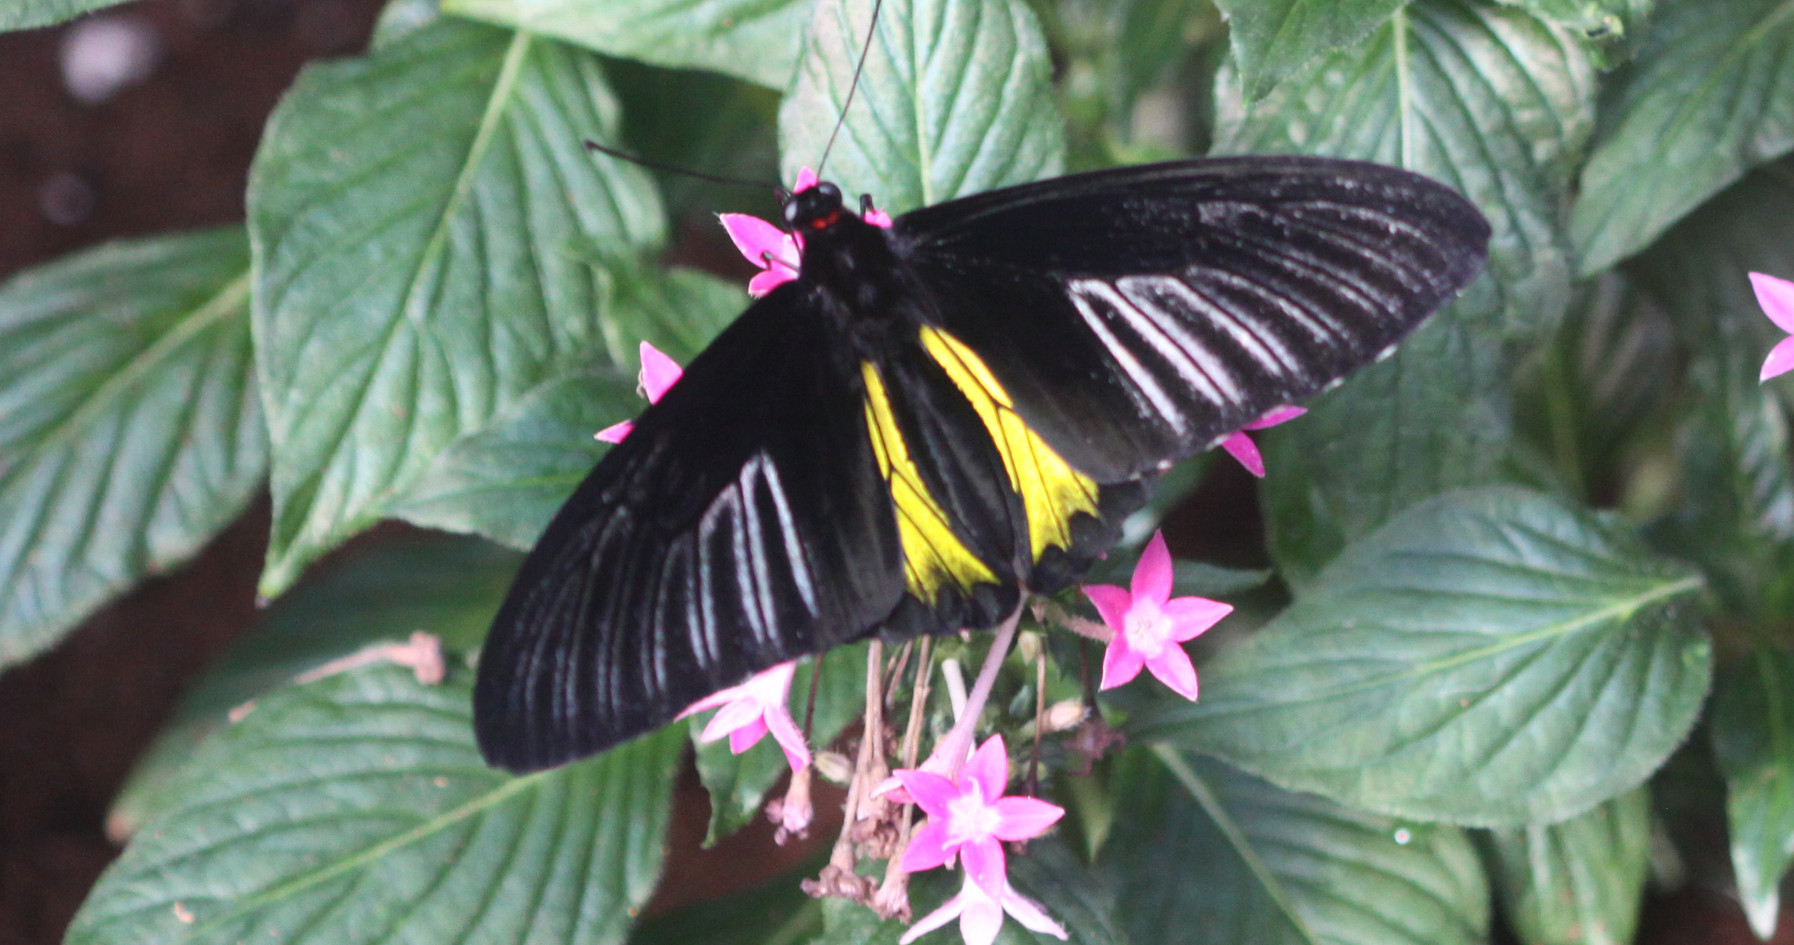 A Common Birdwing